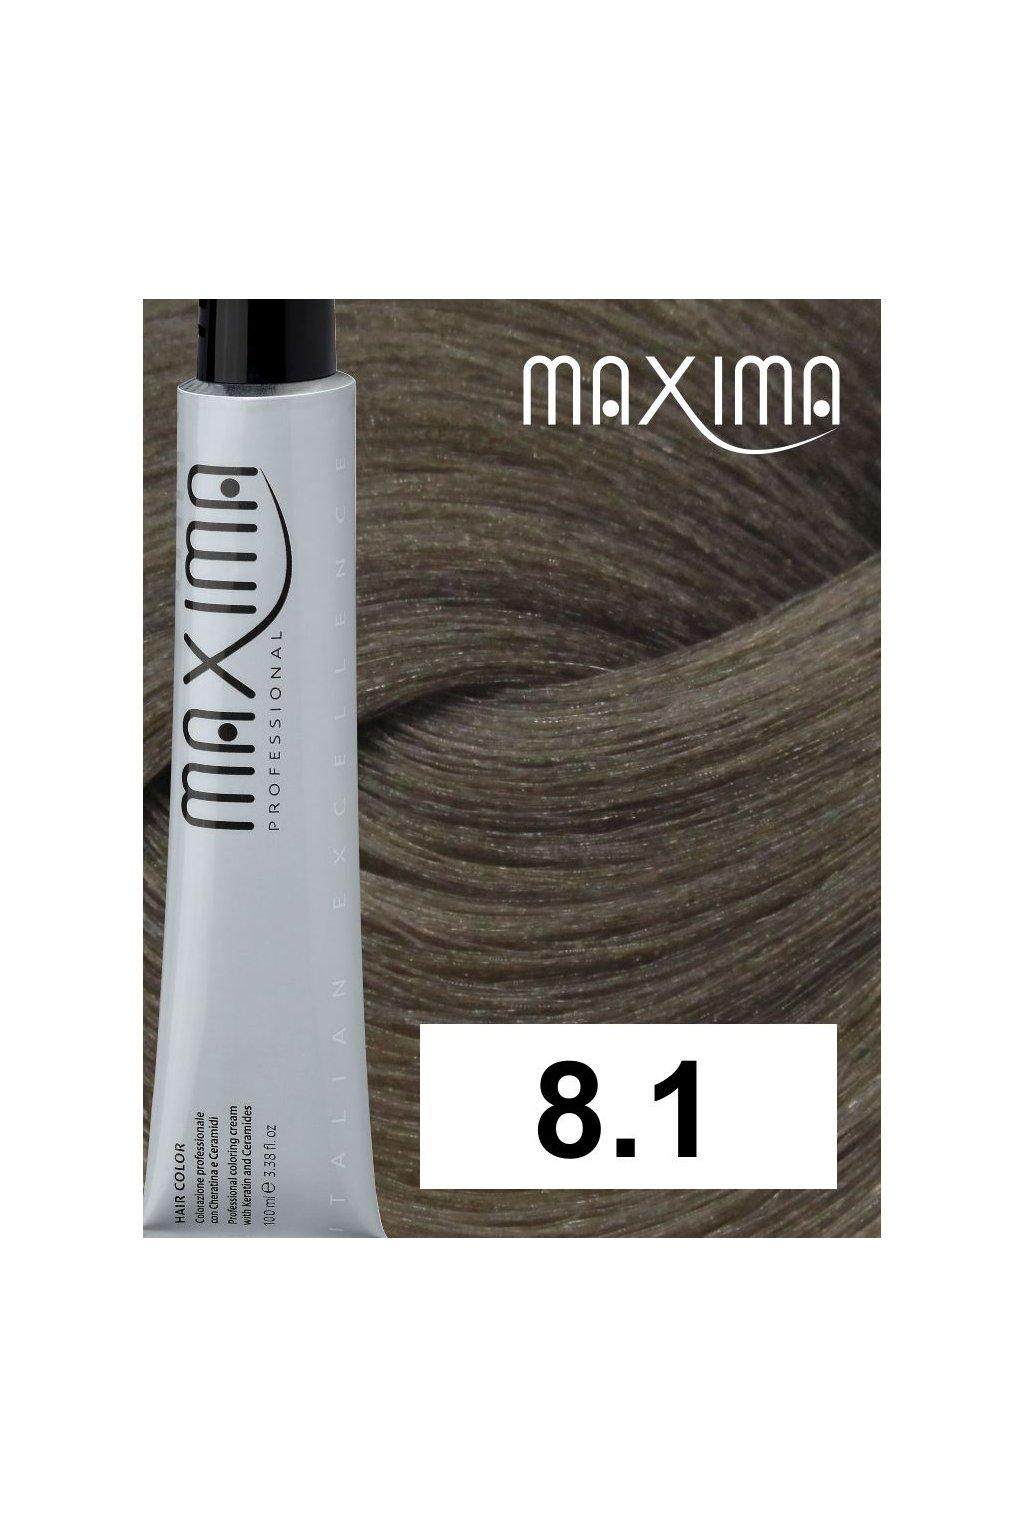 8 1 max